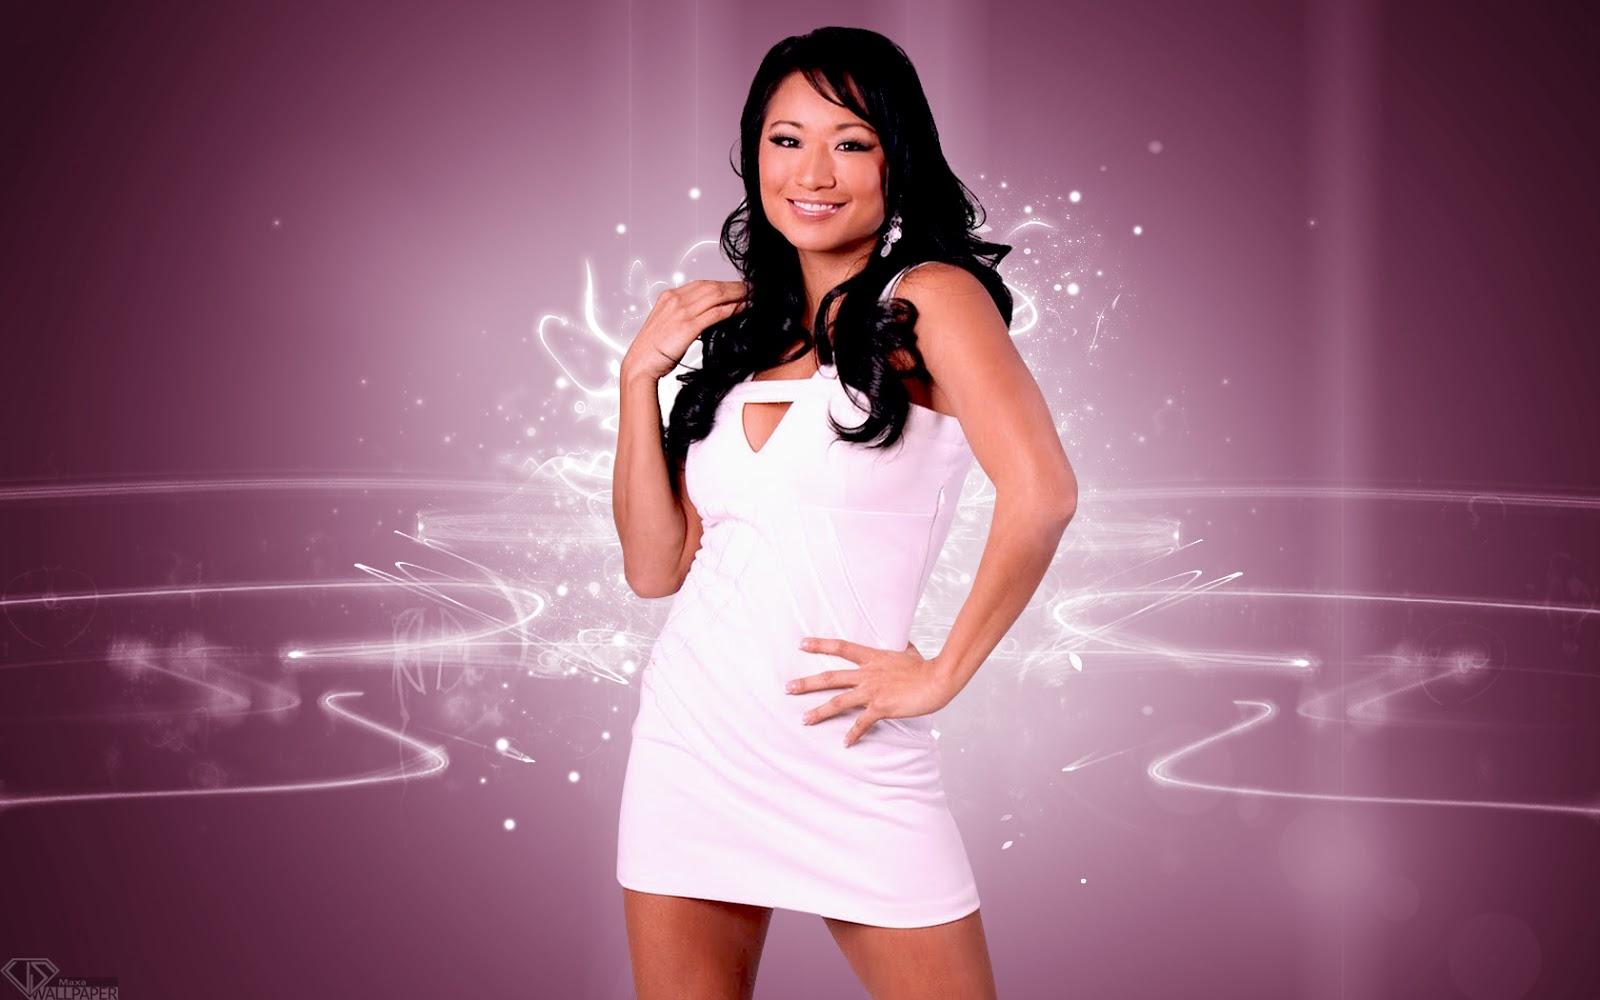 Gail Kim Net Worth